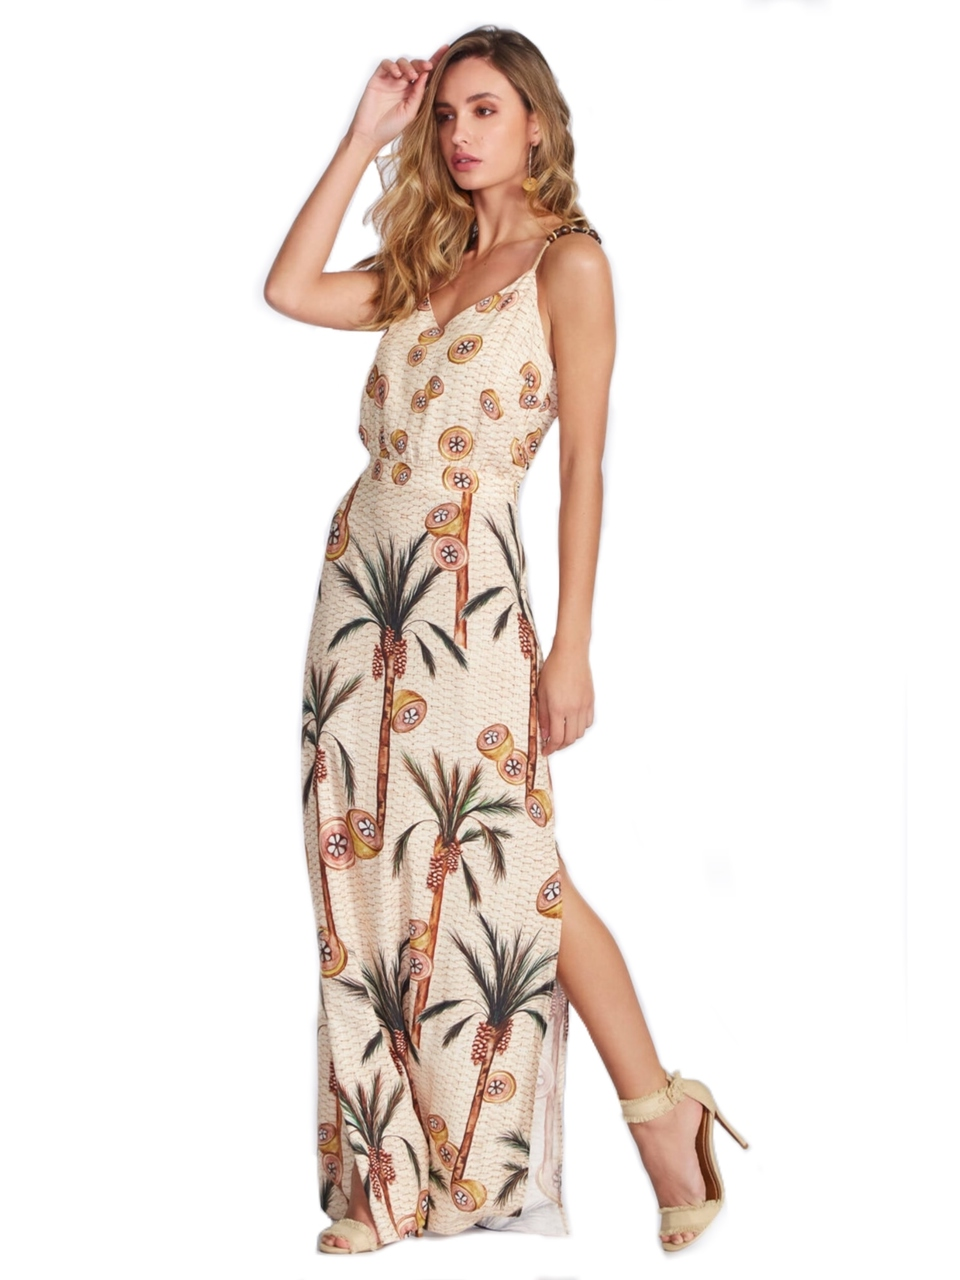 Vestido Feminino Longo Viscose - Flor de Lis